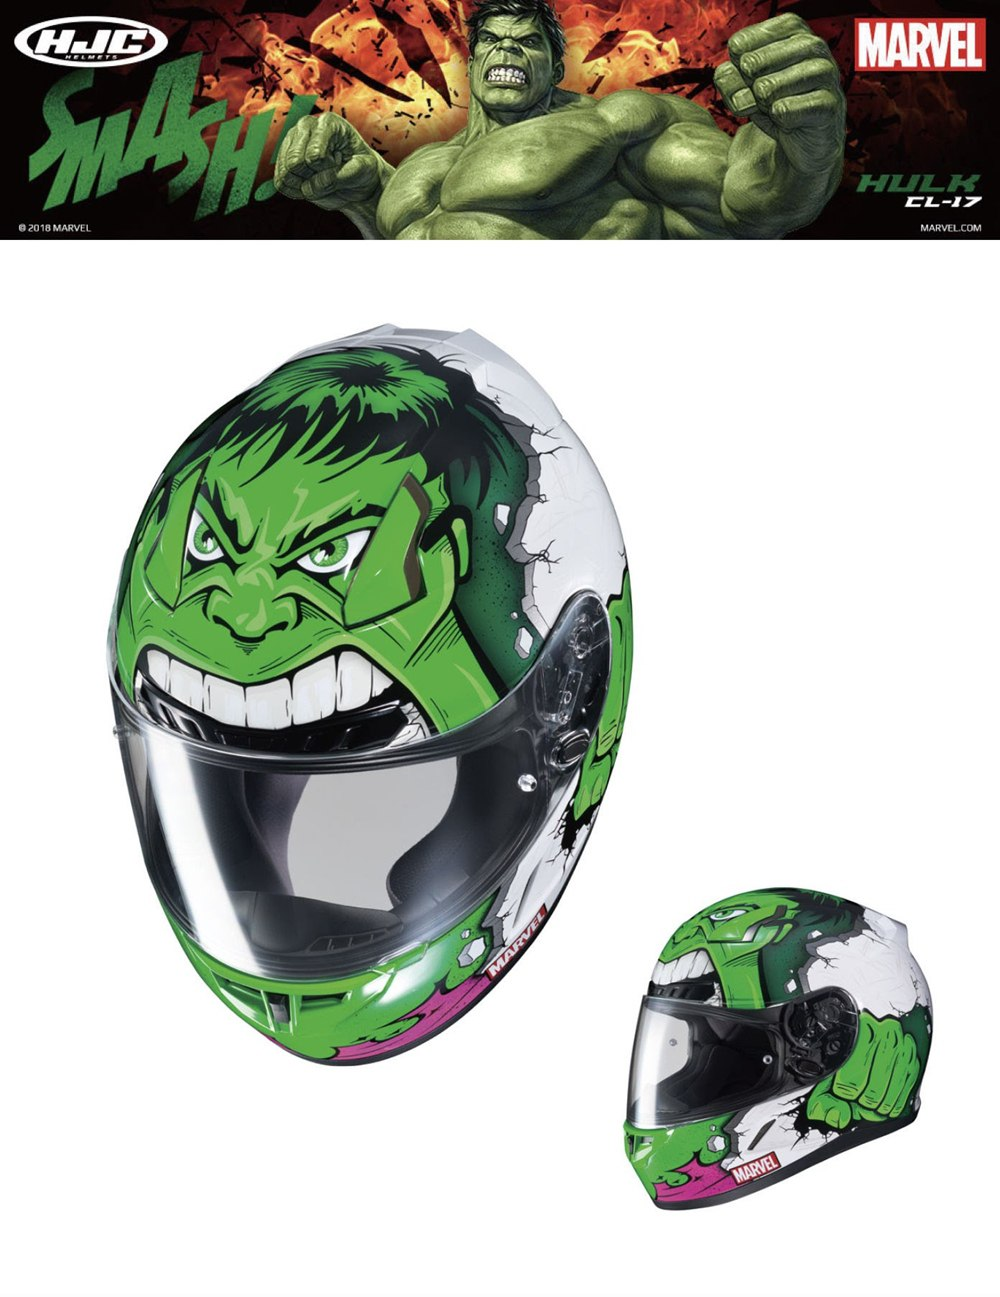 Новинки HJC х Marvel: CL-17 Hulk  и CL-17 Punisher II